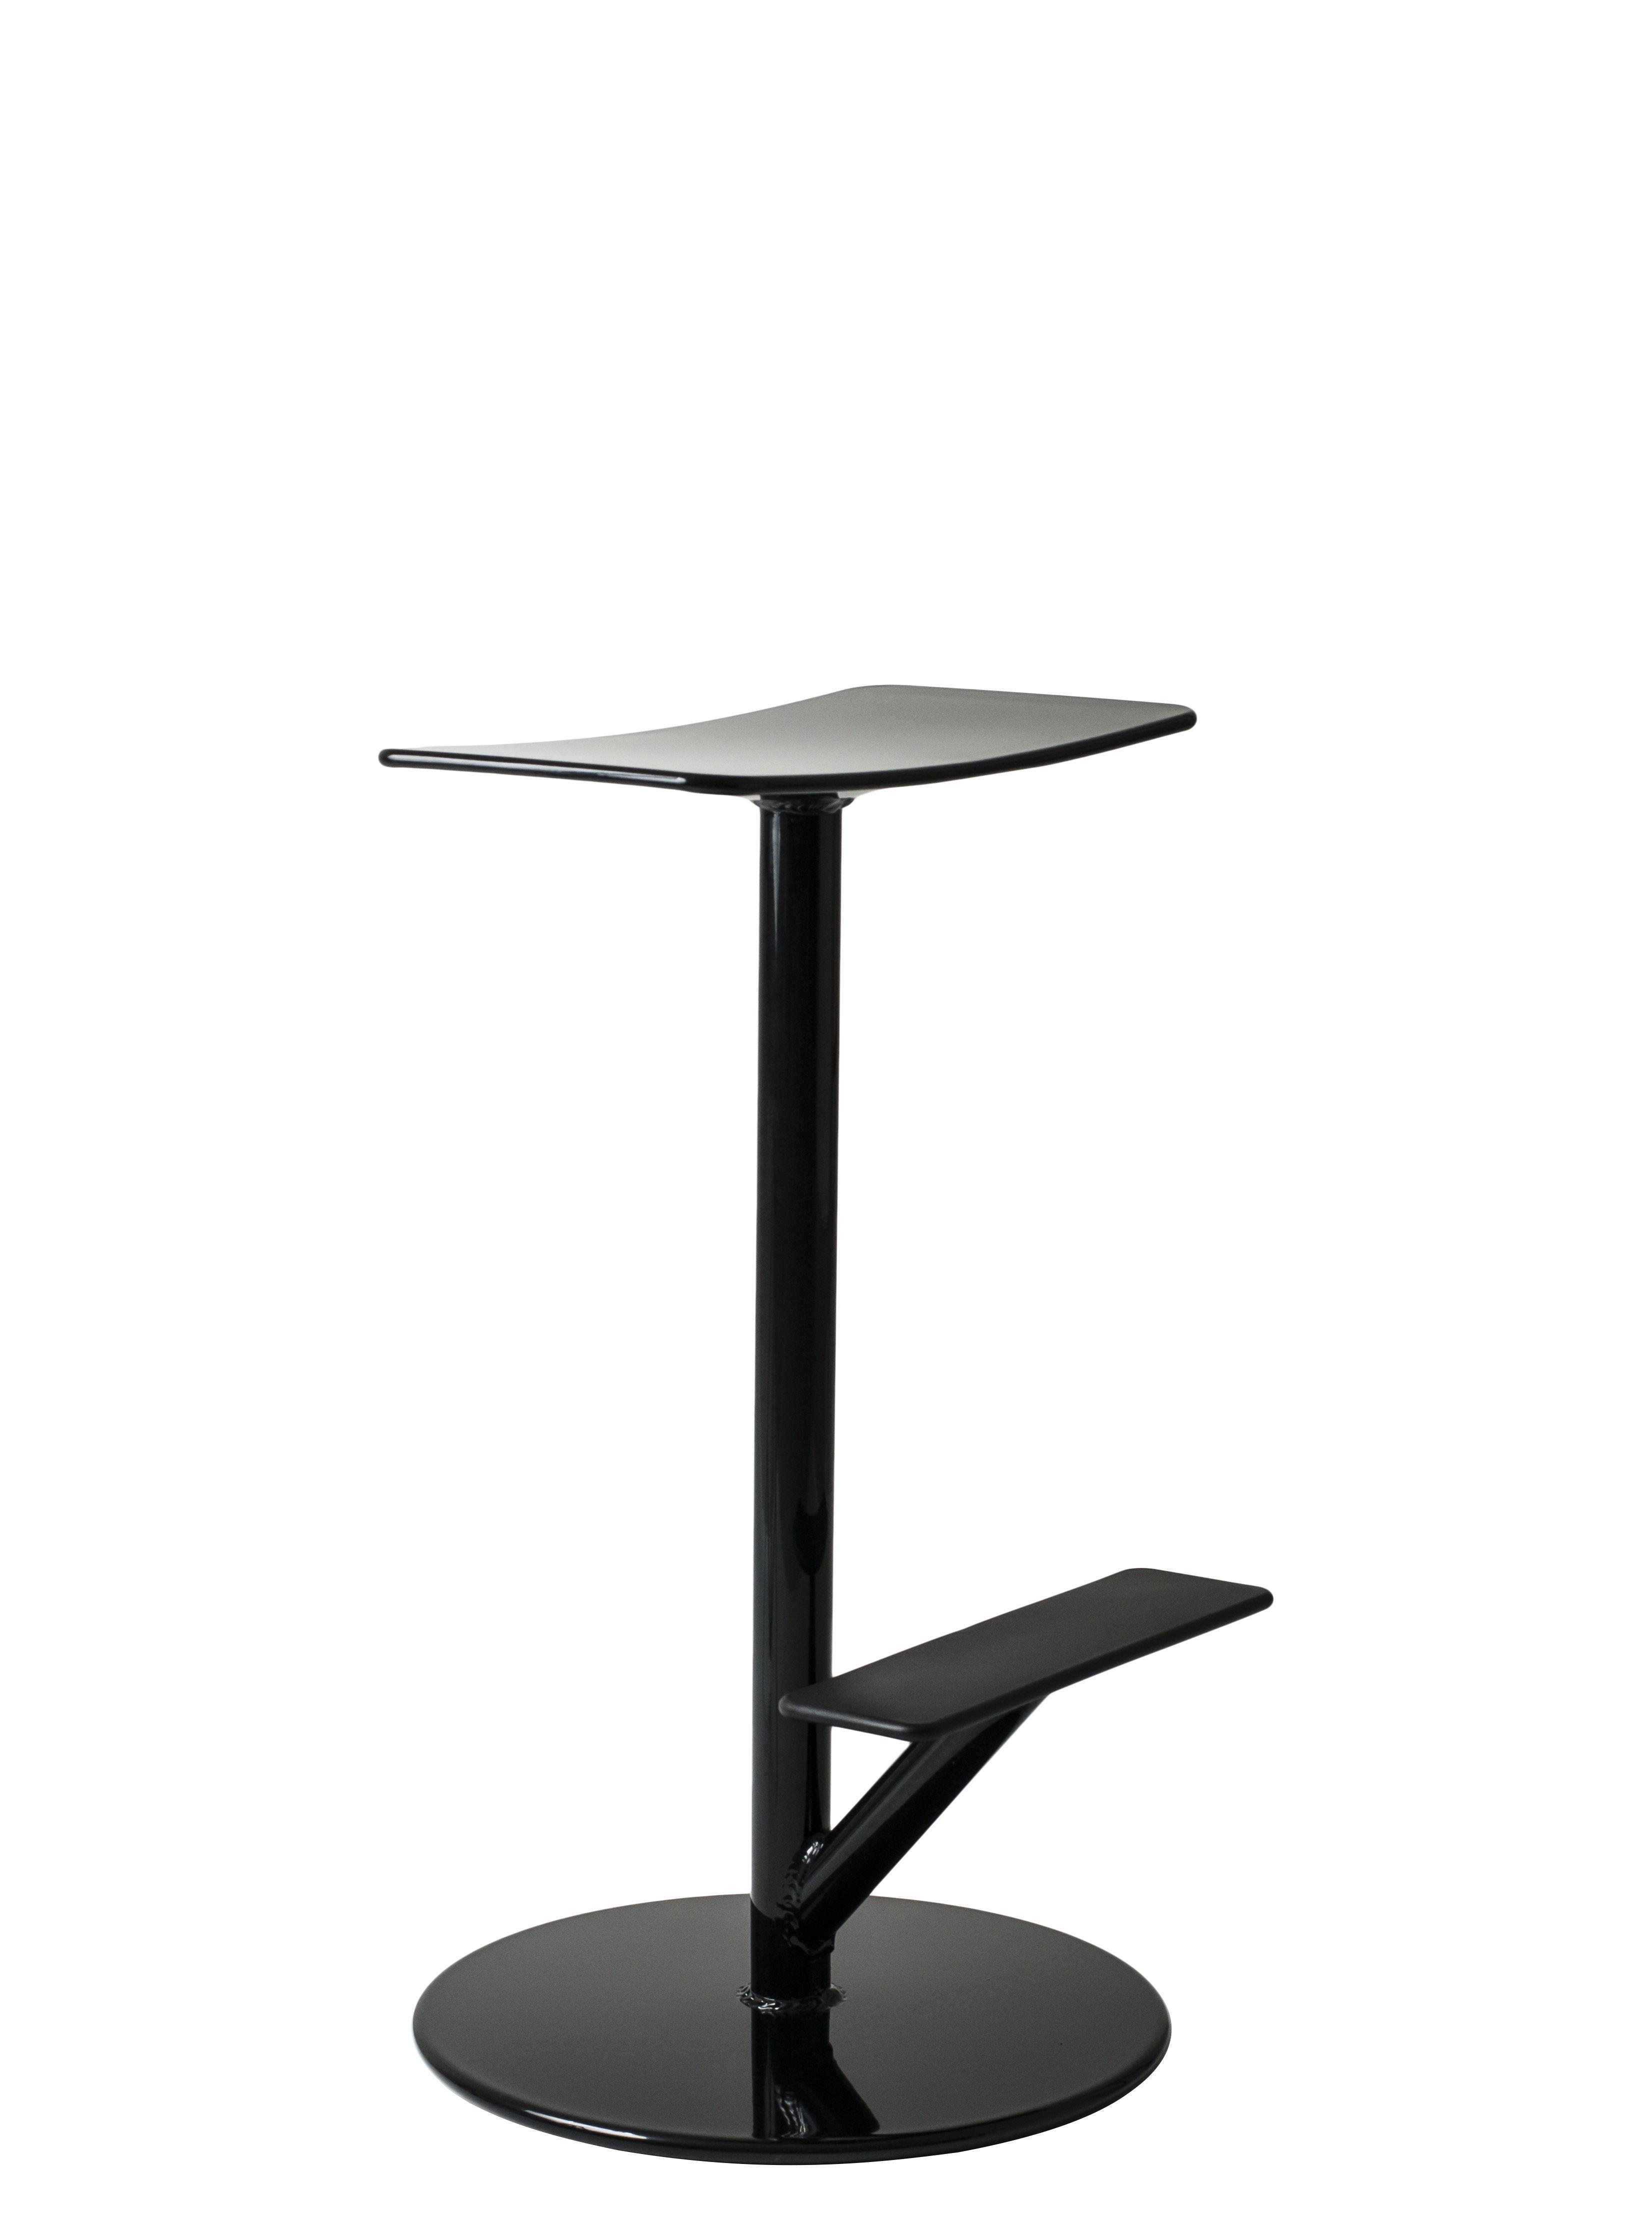 Furniture - Bar Stools - Sequoia High stool - / Metal - H 65 cm by Magis - Black - Steel